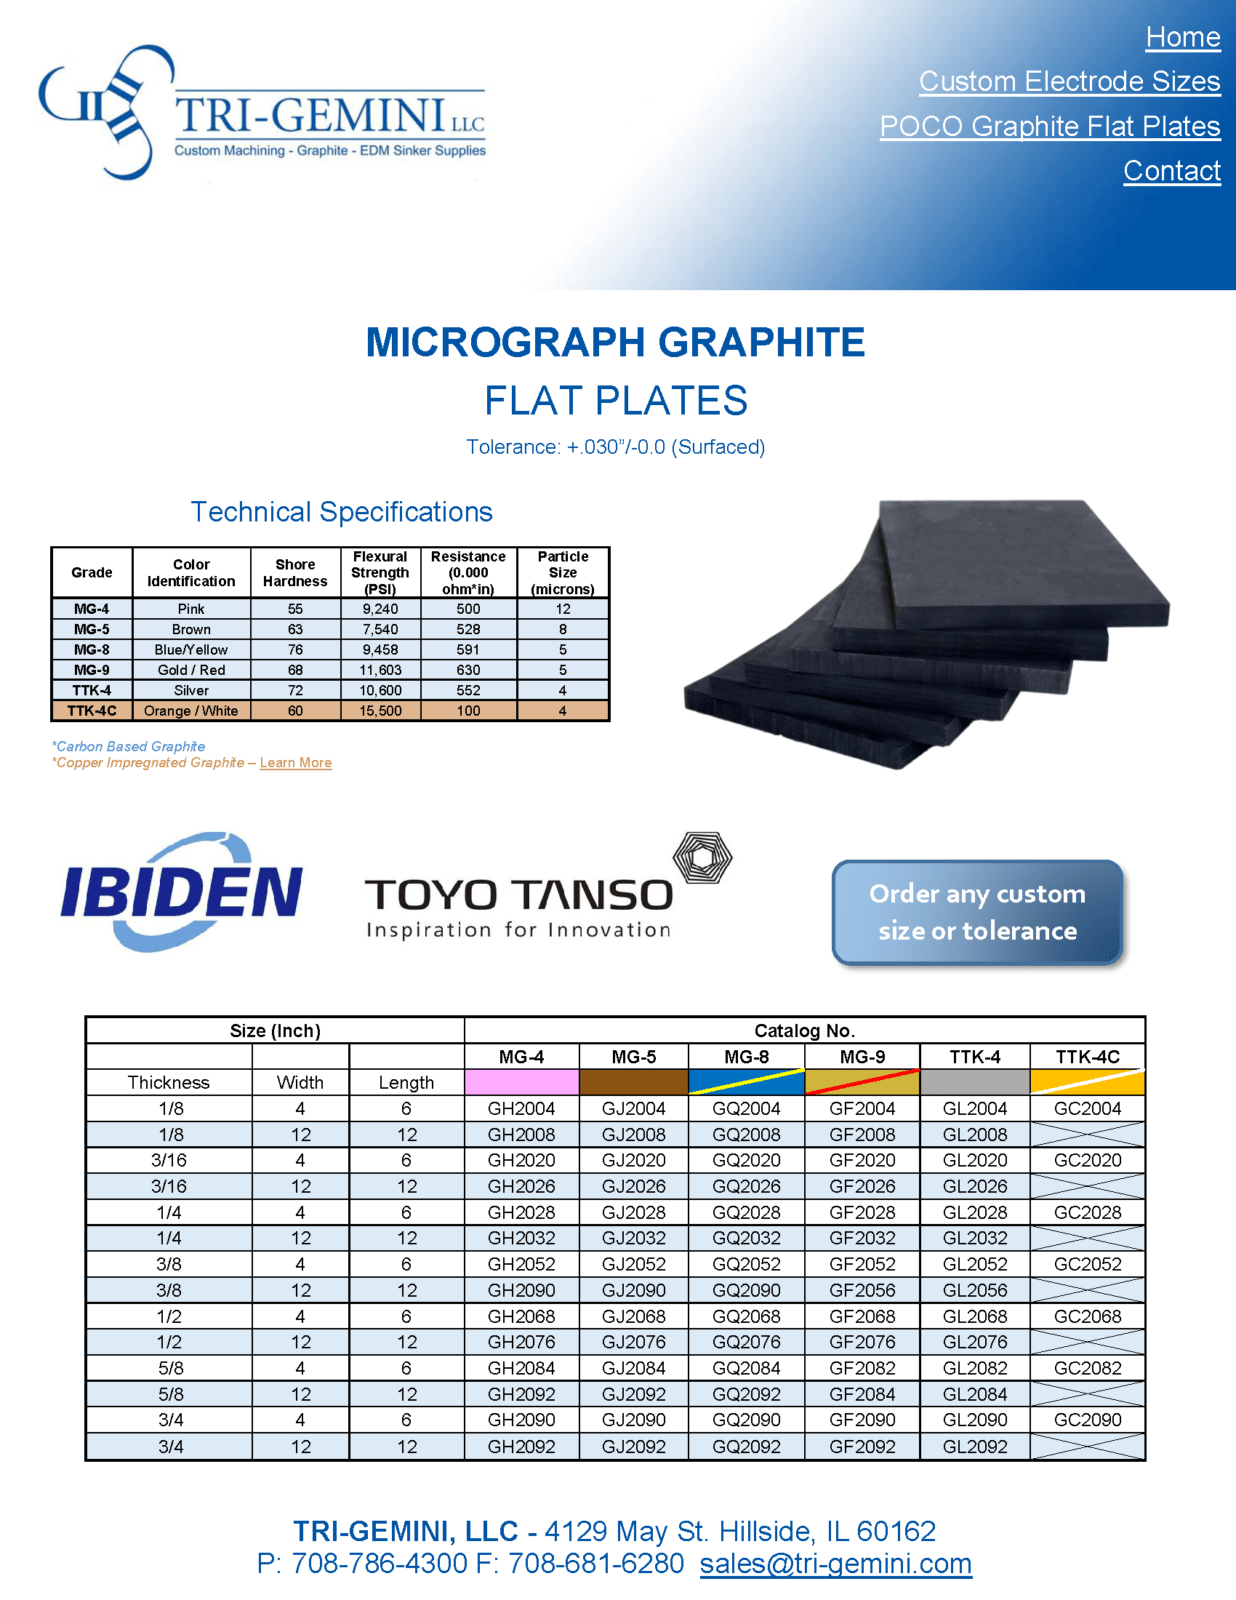 EDM Graphite  Flat Plate Electrode Toyo Tanso Flat Plates